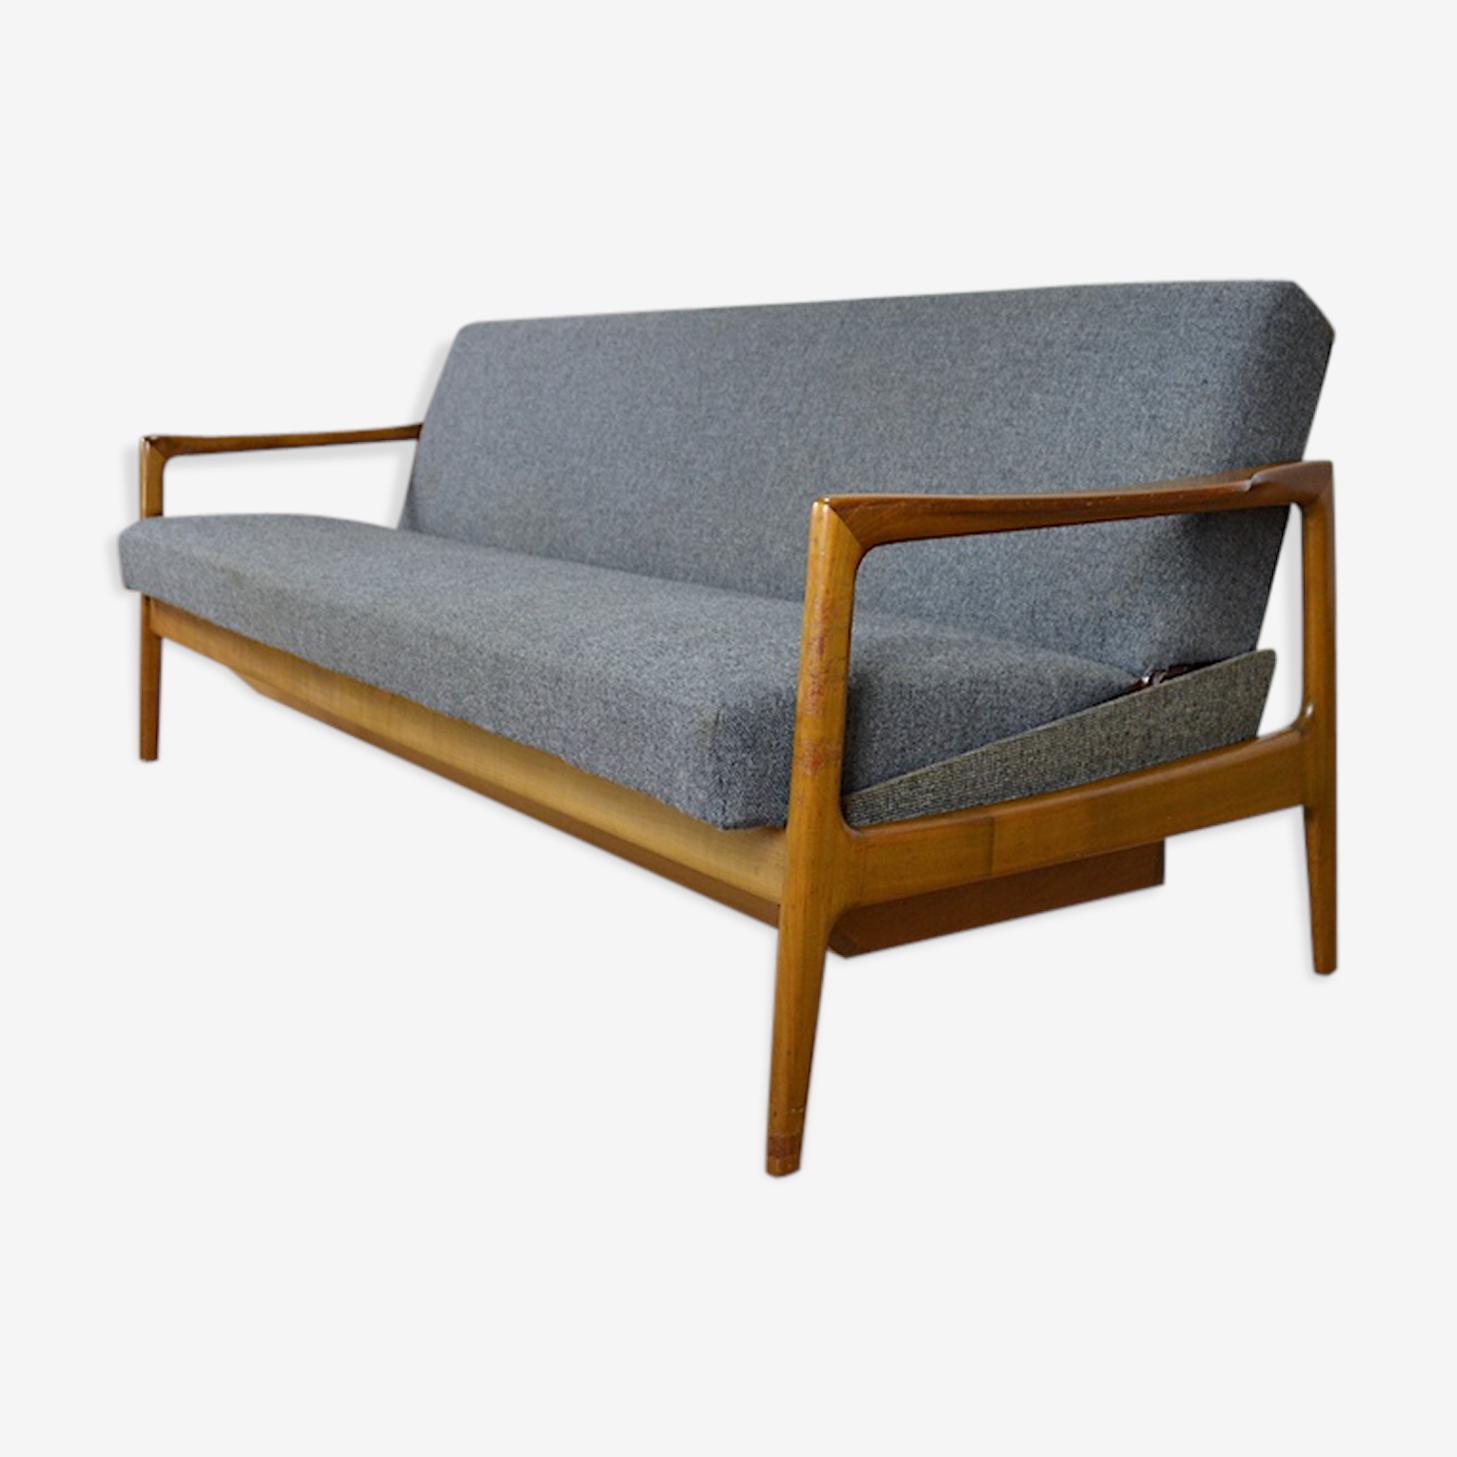 Daybed Design Scandinavian Vintage year 1960